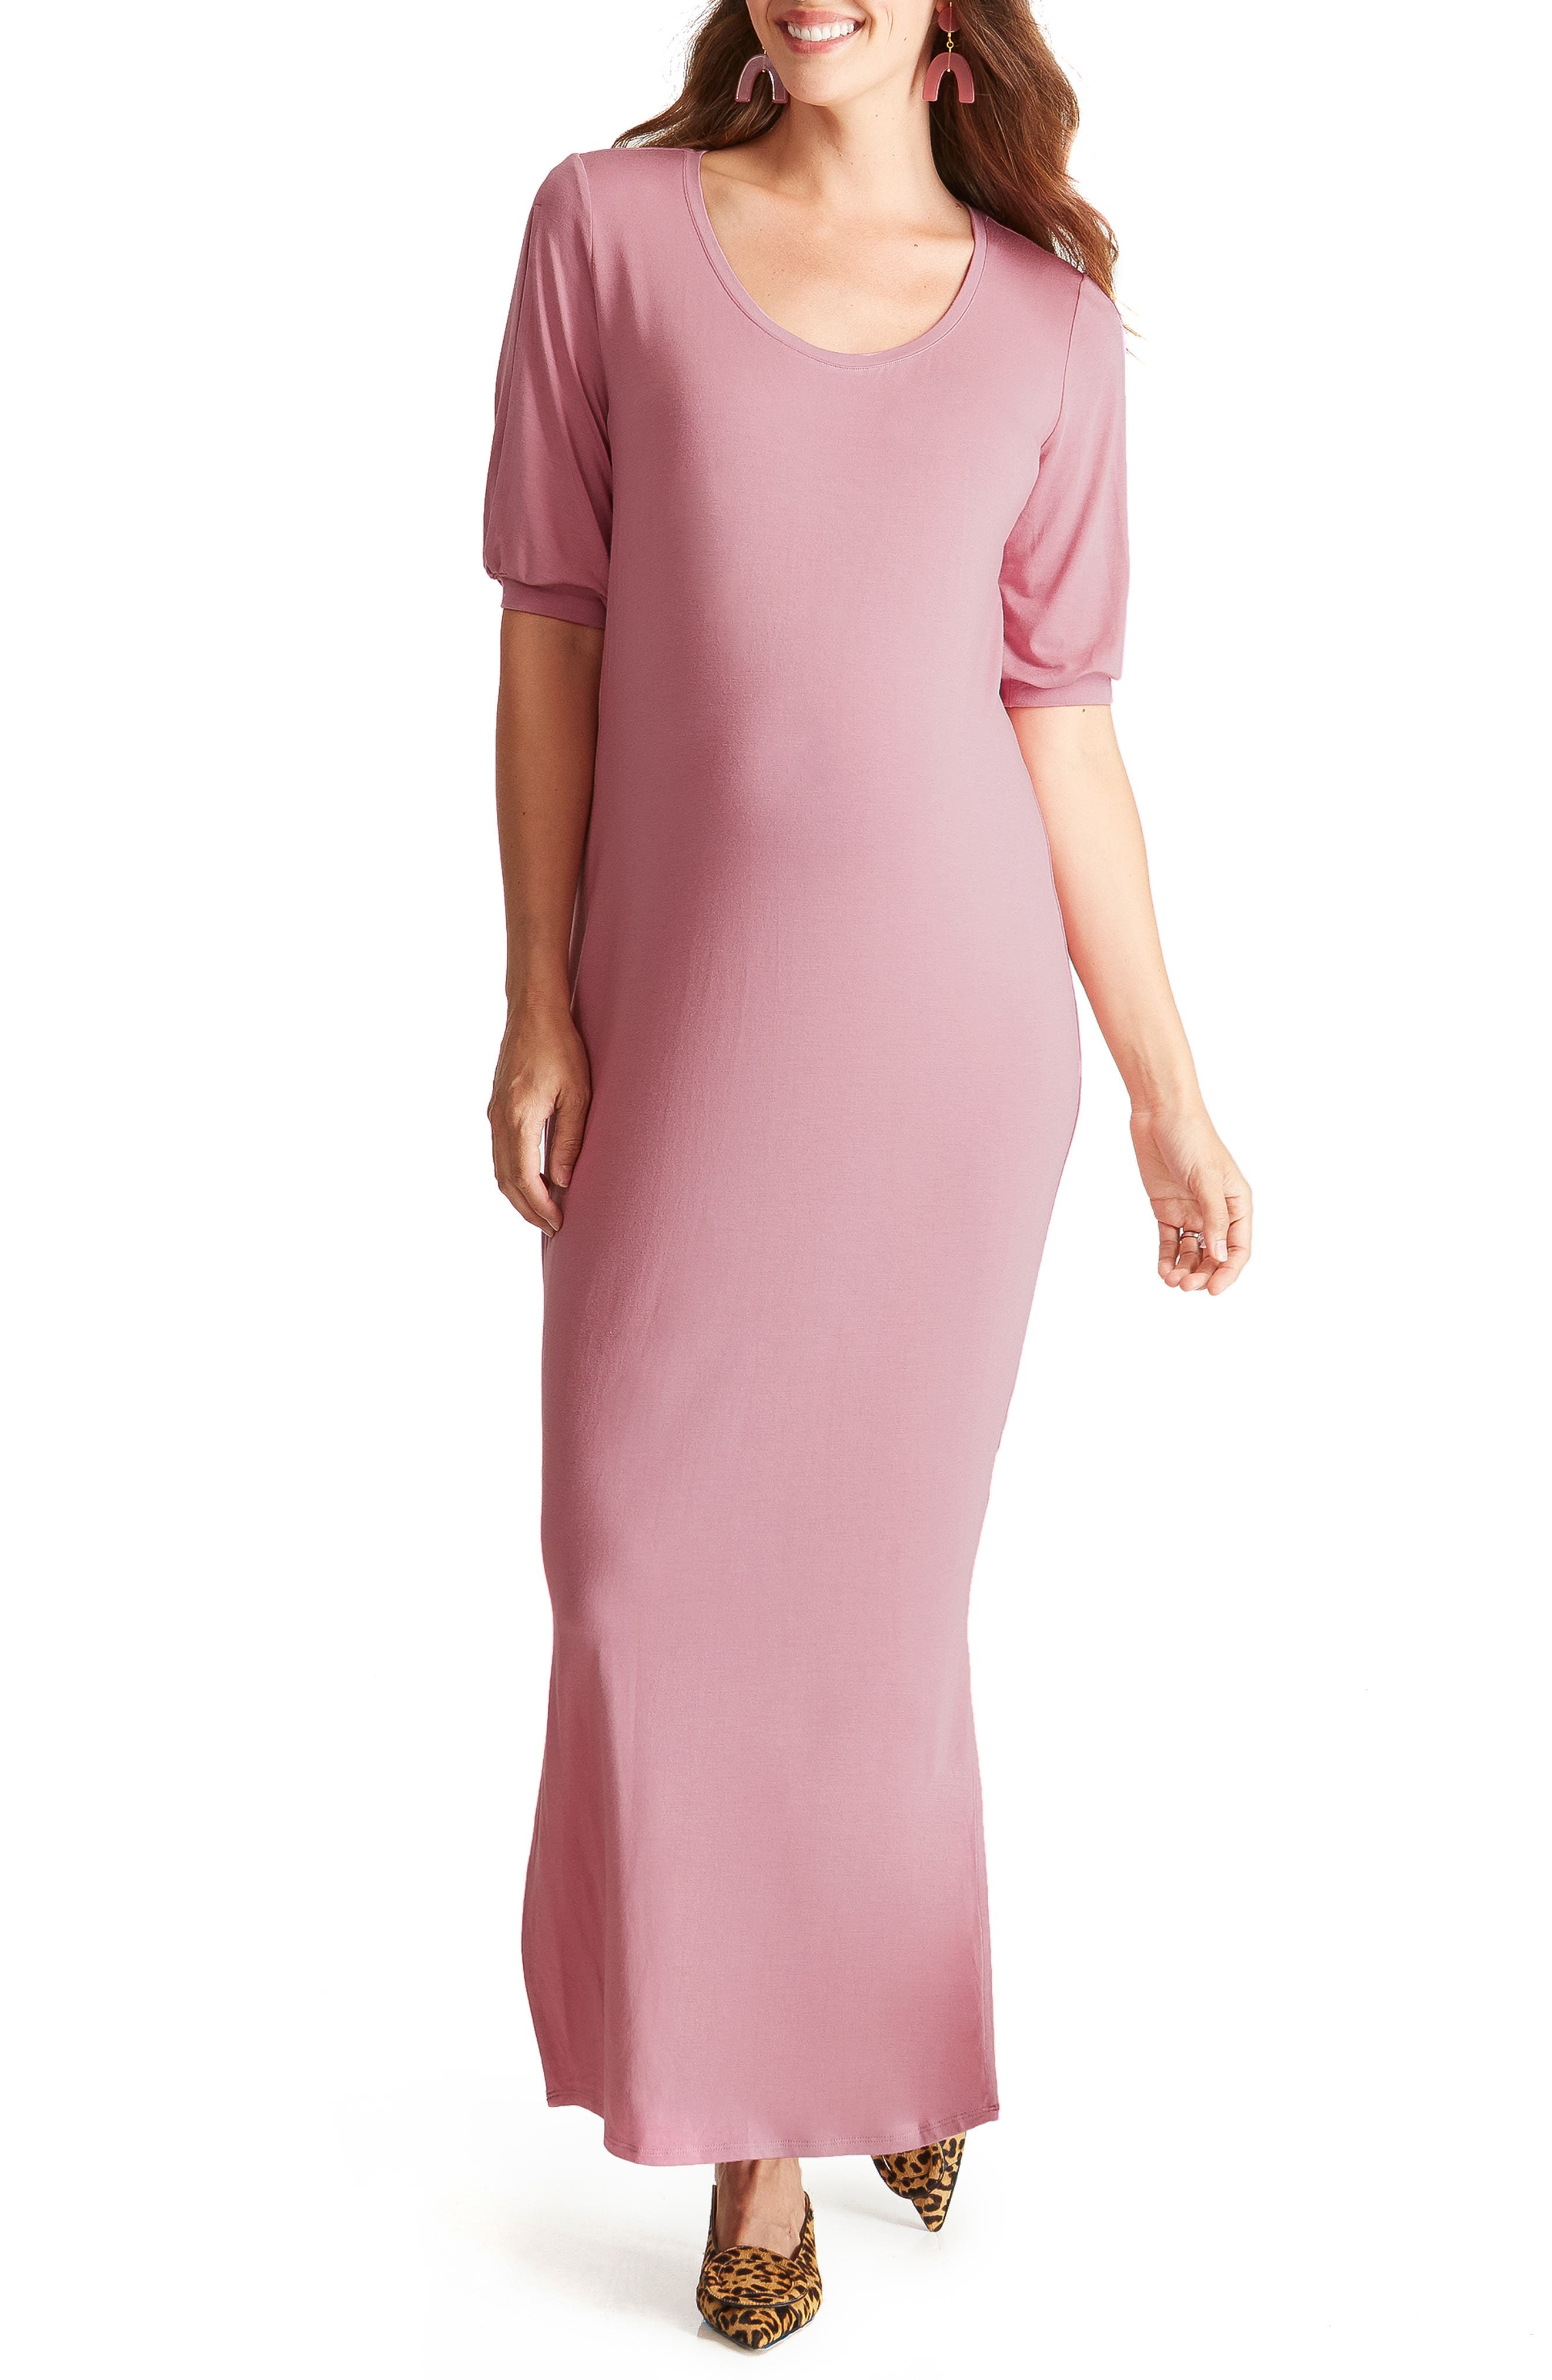 Ingrid & Isabel Split Sleeve Knit Maternity Maxi Dress, Pink